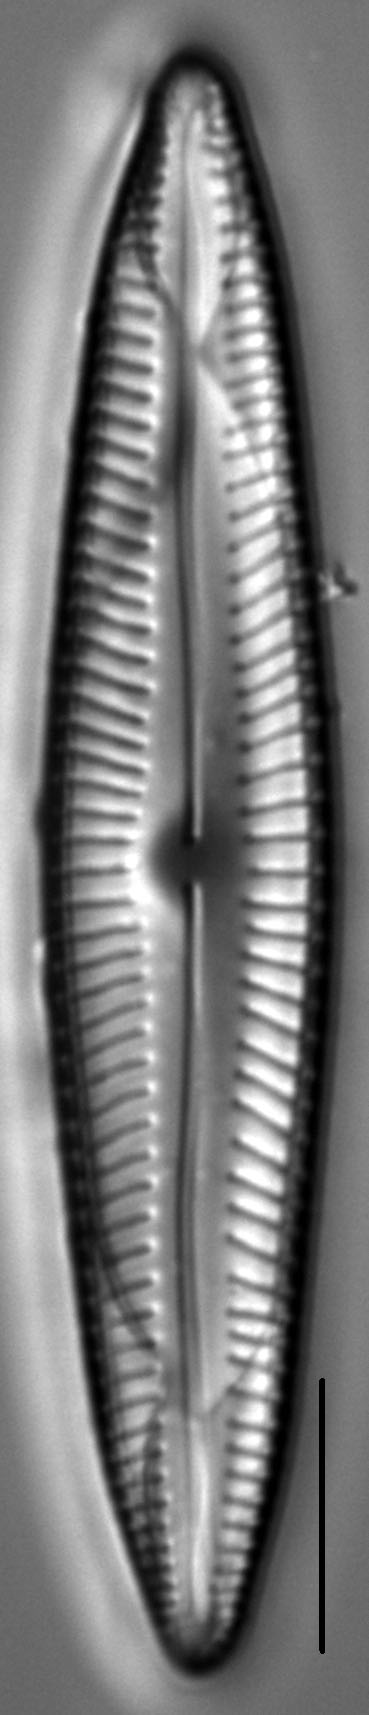 Encyonopsis Stodderi 3